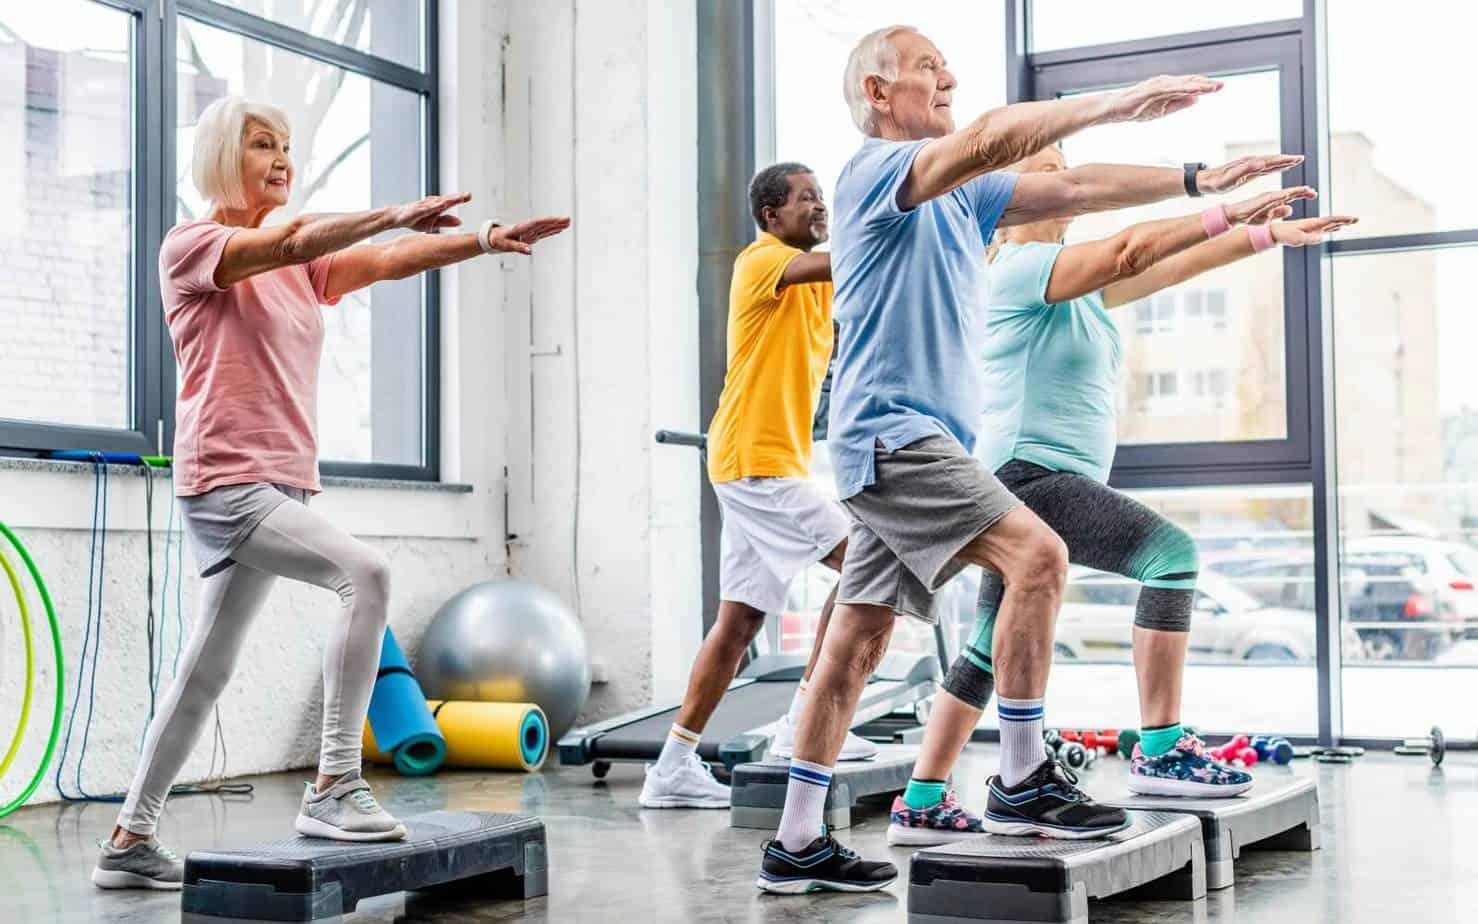 Senior athletes doing hiit workouts on step platforms at gym